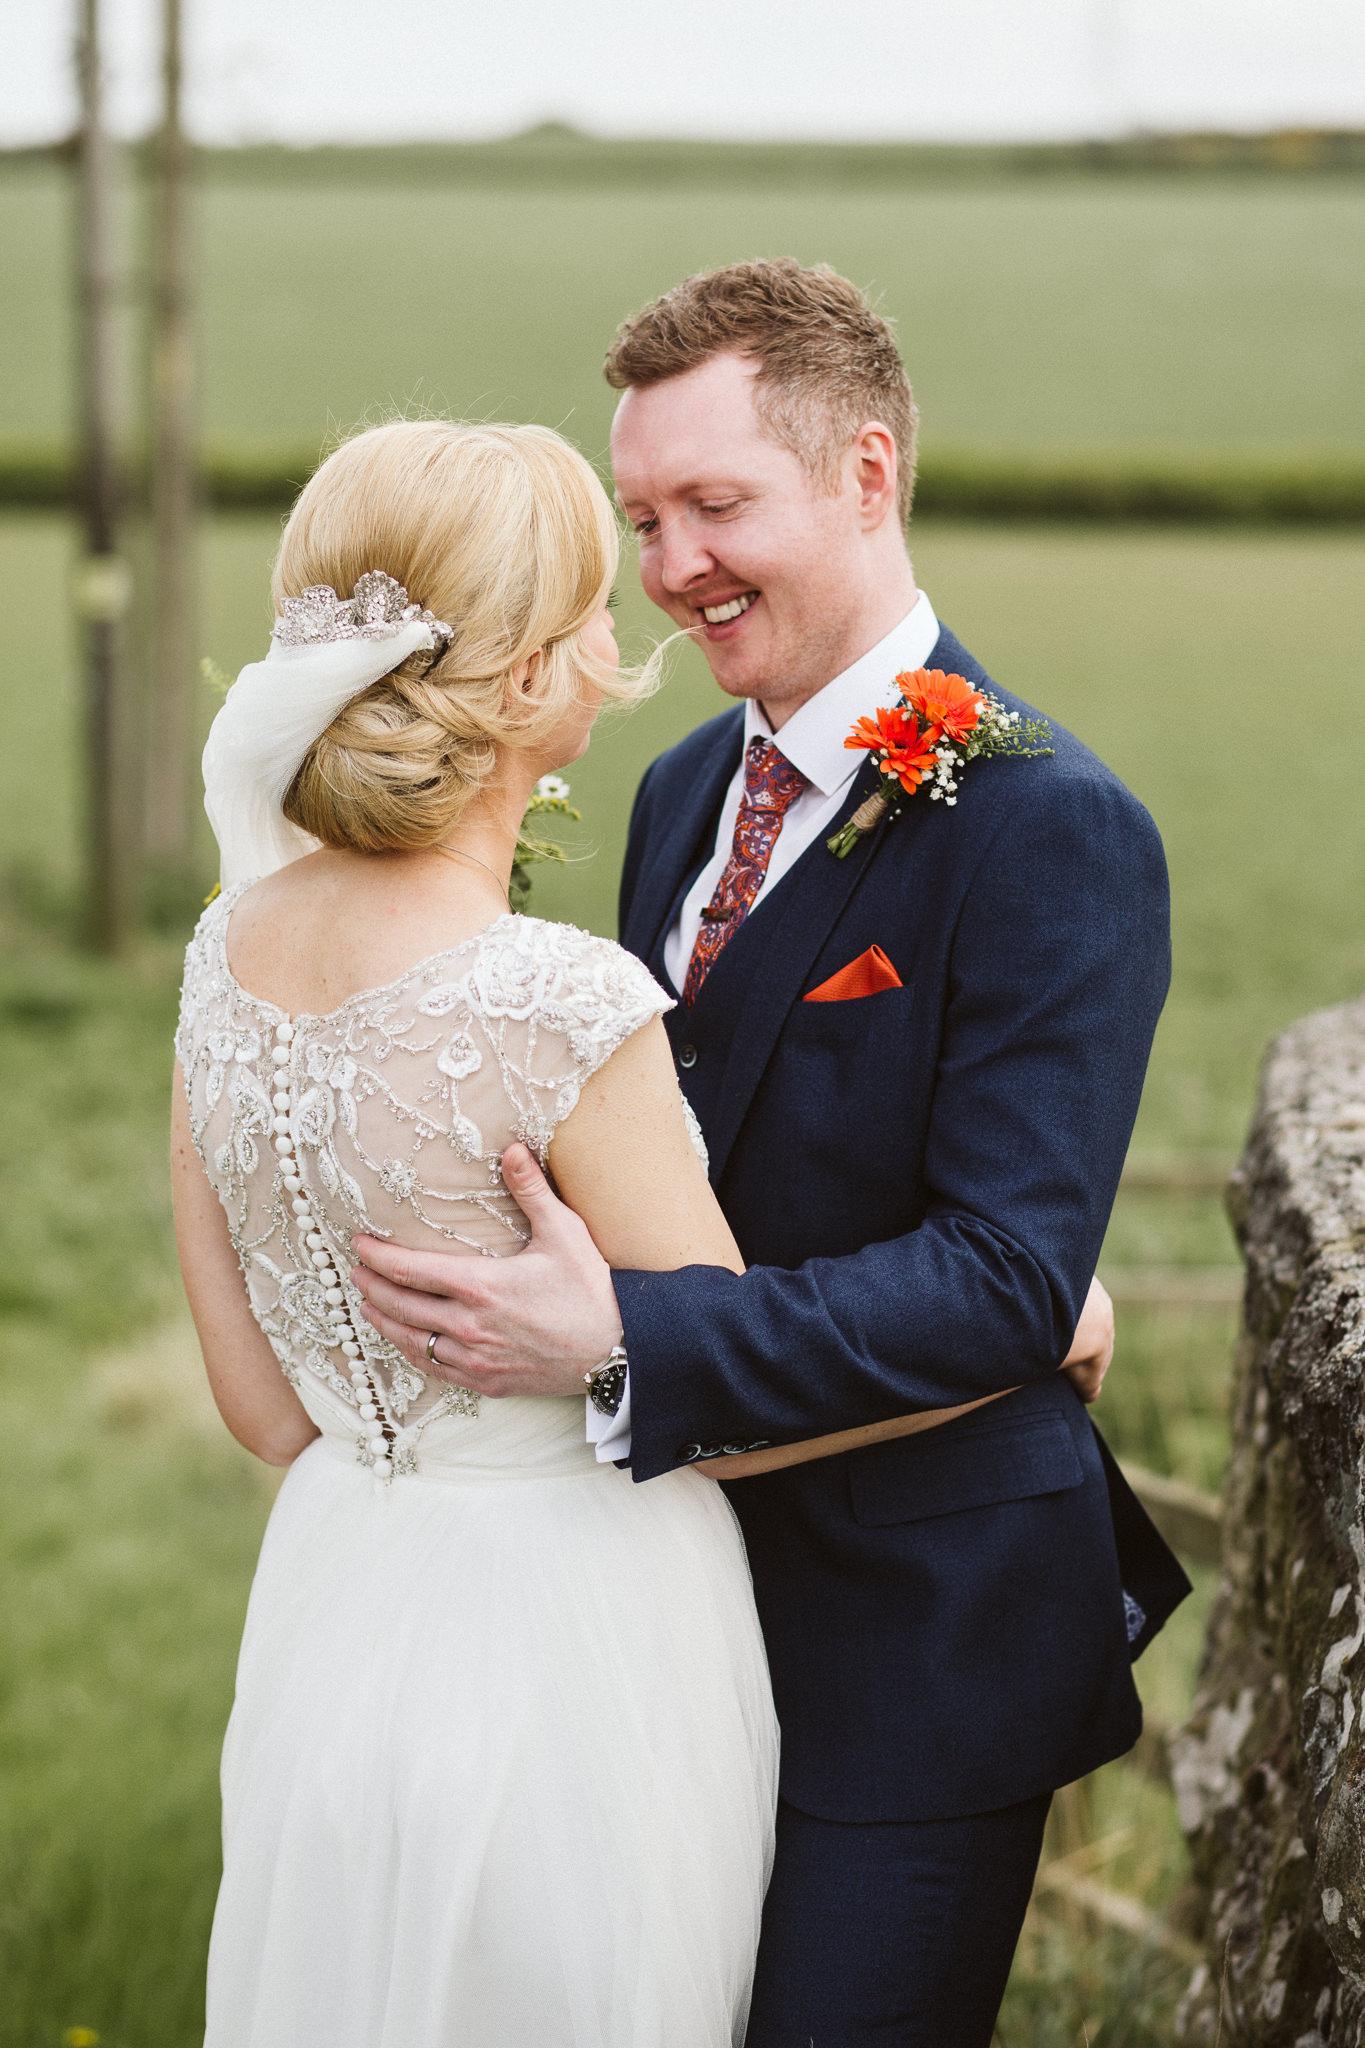 northside-farm-wedding-northumberland-margarita-hope (75).jpg